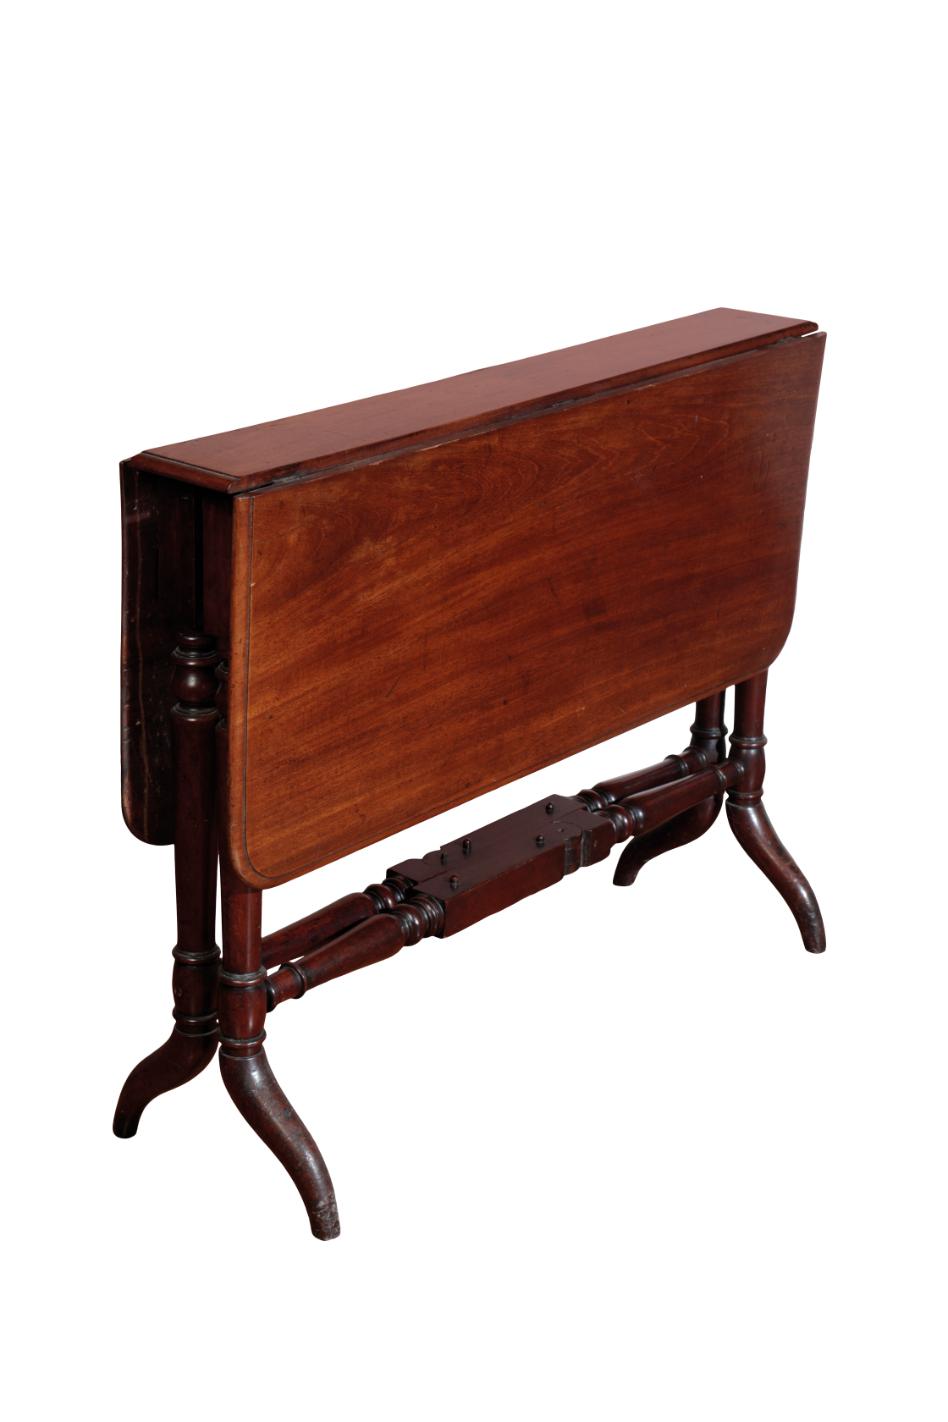 A MAHOGANY SUTHERLAND TABLE,